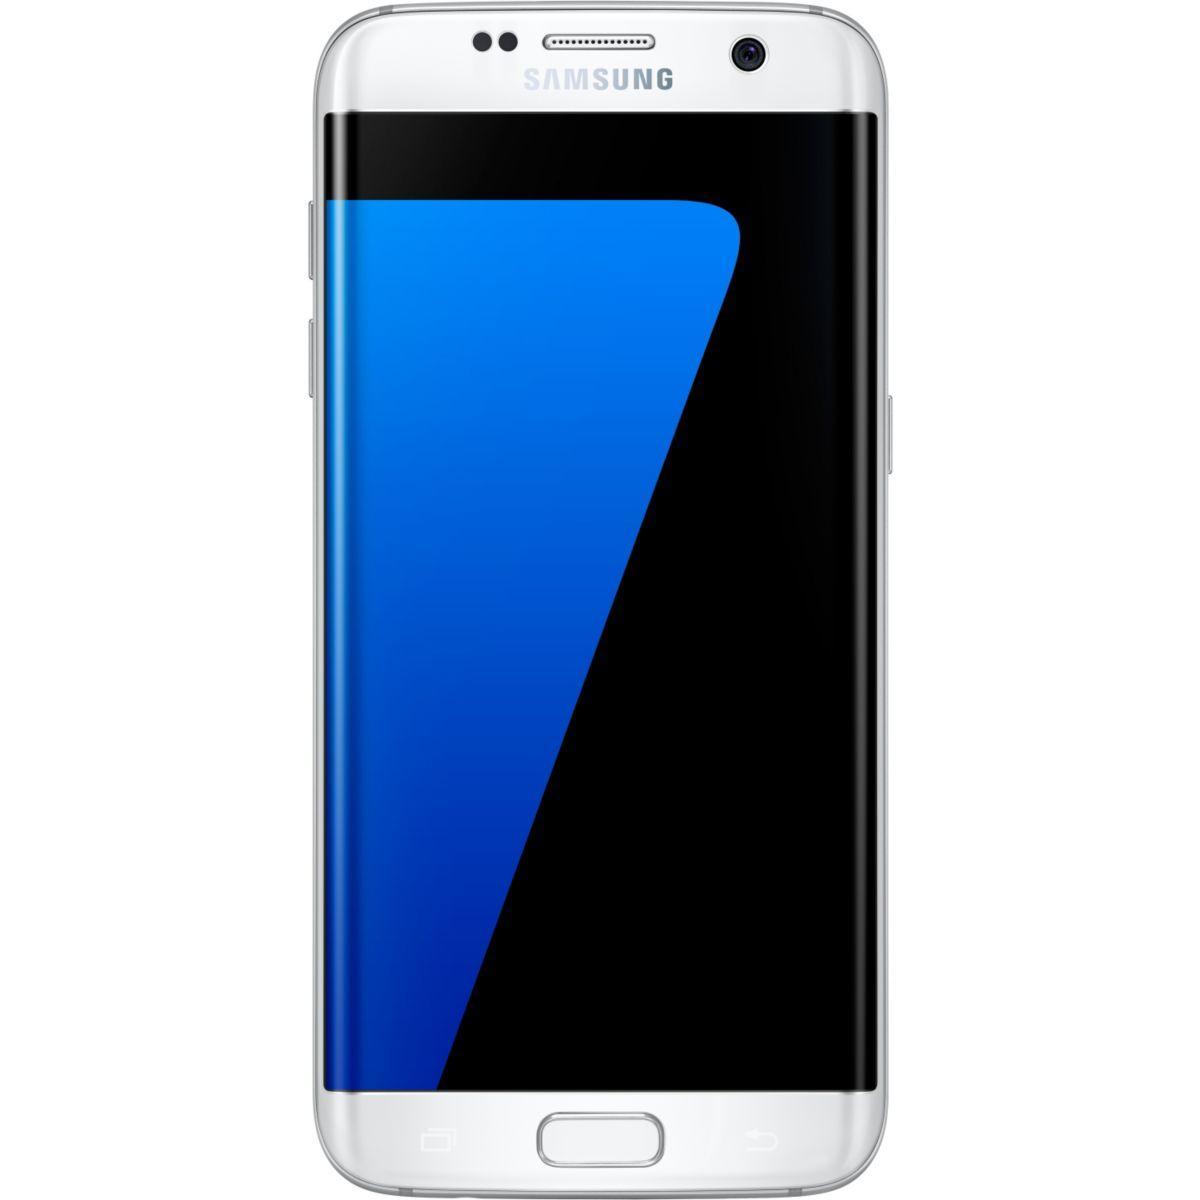 Pack promo smartphone samsung galaxy s7 edge 32go blanc + etui samsung s view cover galaxy s7 edge silver - soldes et bonnes affaires à prix imbattabl